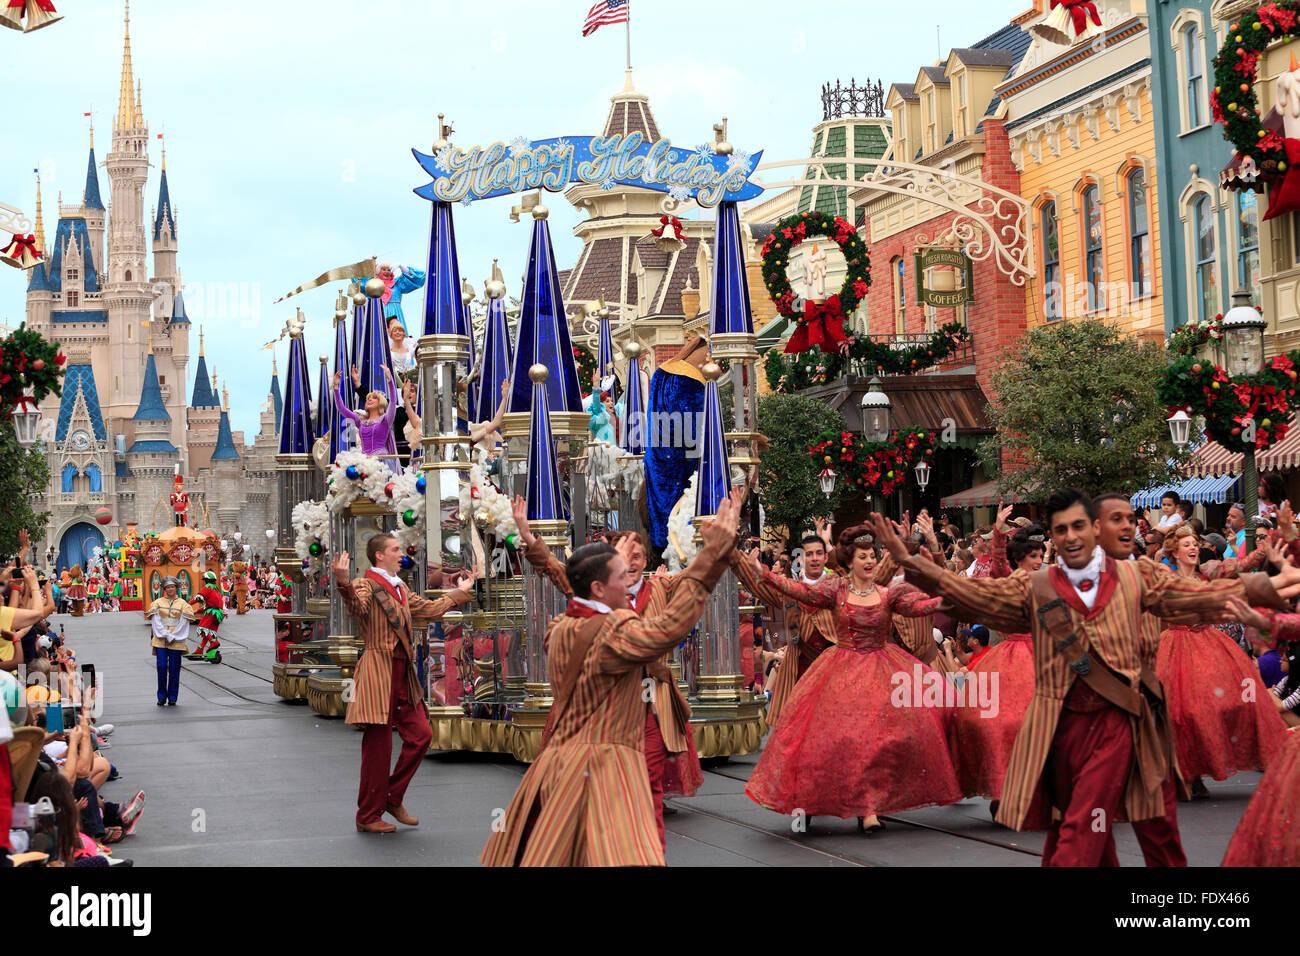 Christmas Parade in Magic Kingdom, Orlando, Florida Stock Photo